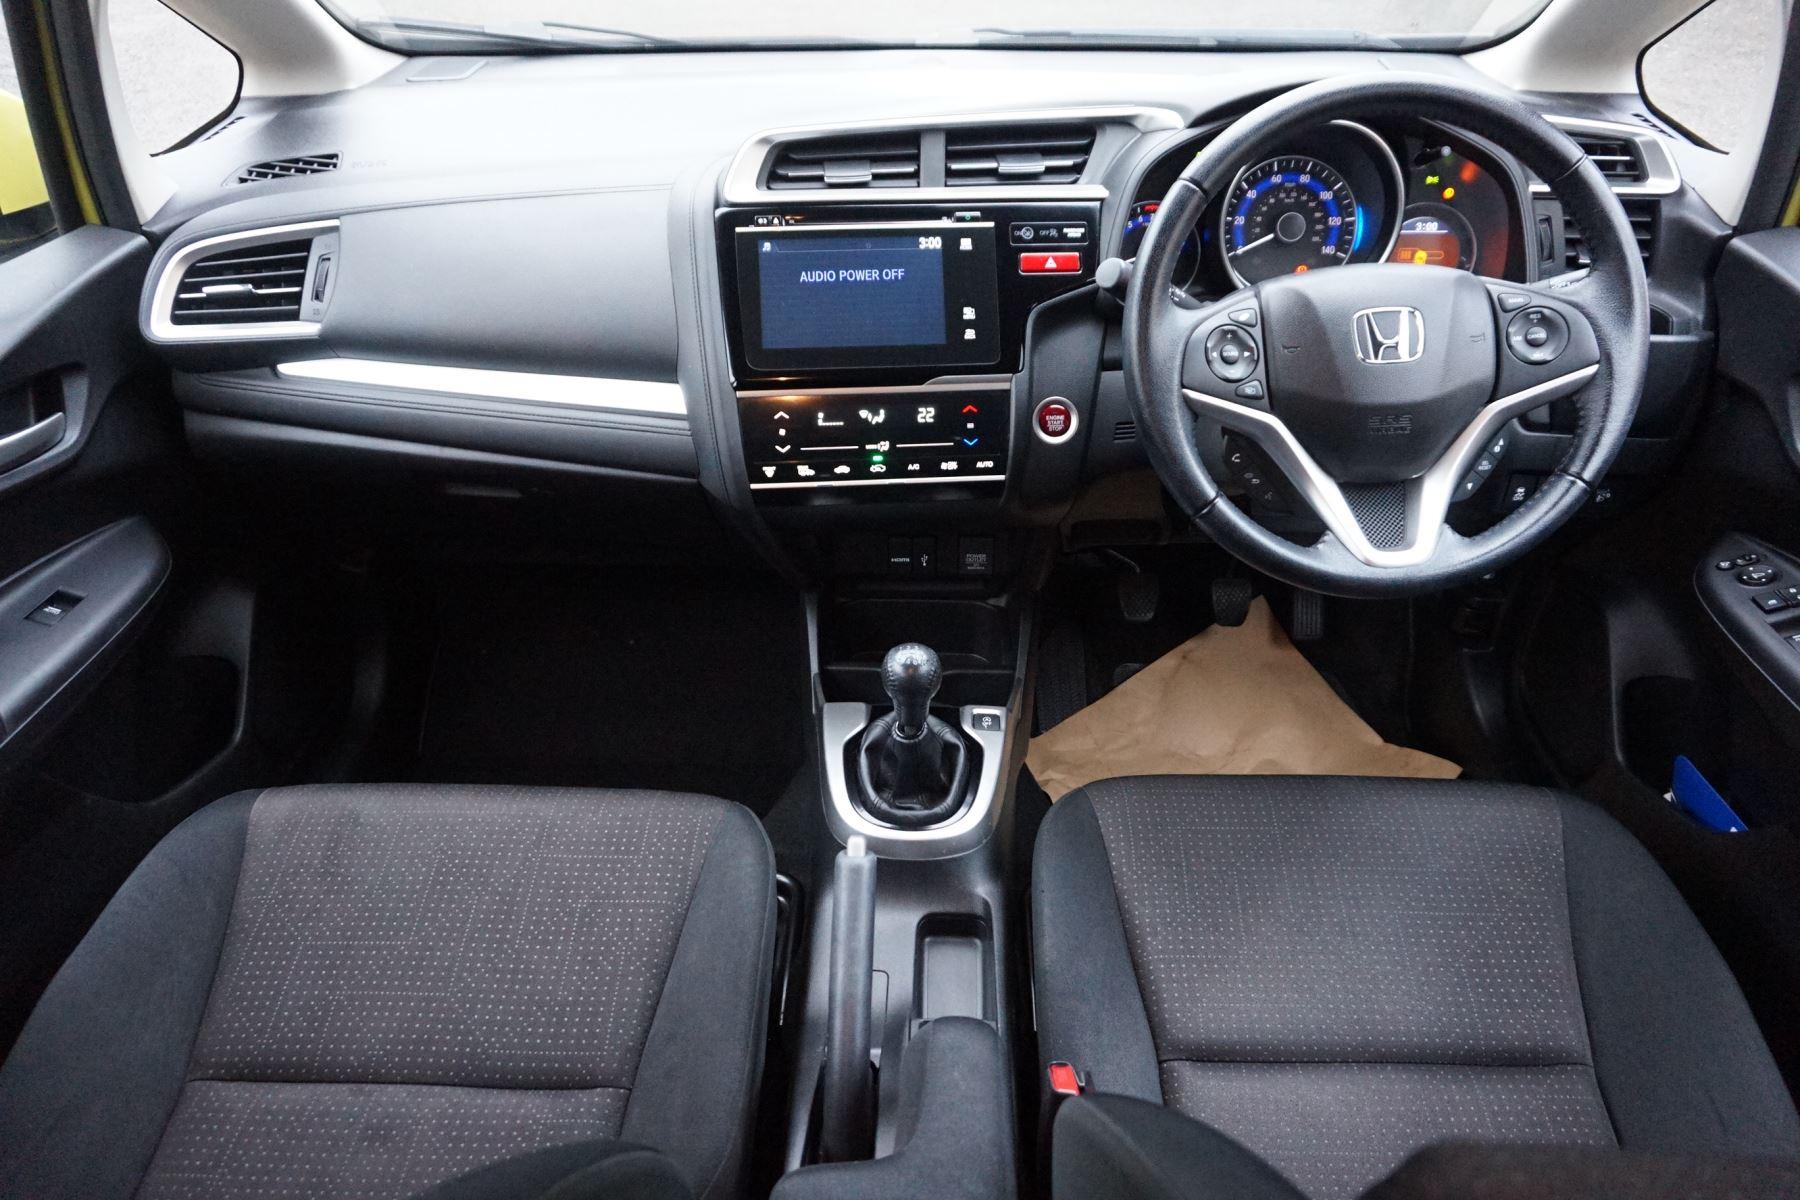 Honda Jazz 1.3 EX 5dr image 9